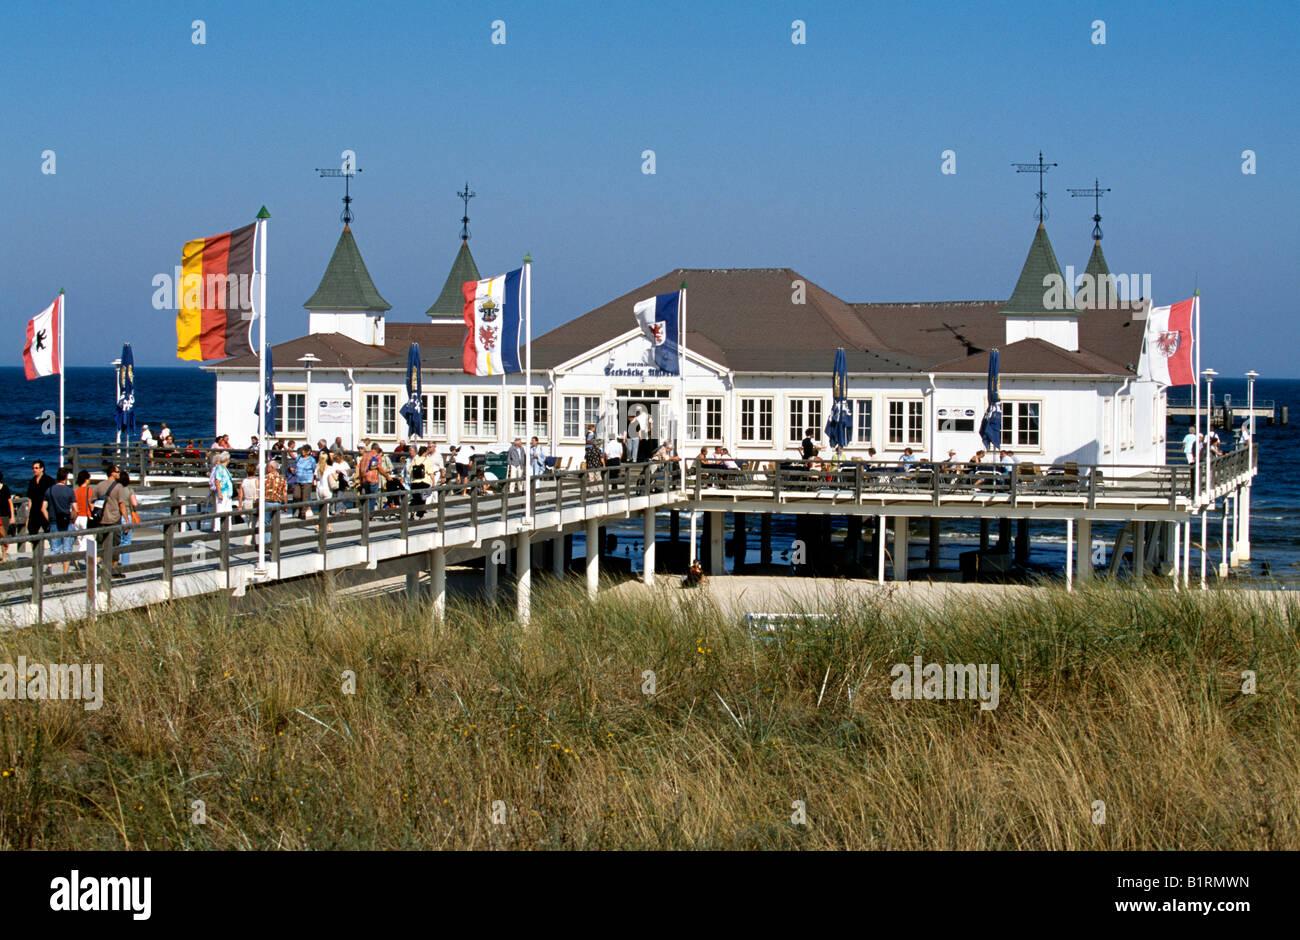 Pier, Ahlbeck, Usedom, Baltic Sea, Mecklenburg-Vorpommern, Germany Stock Photo